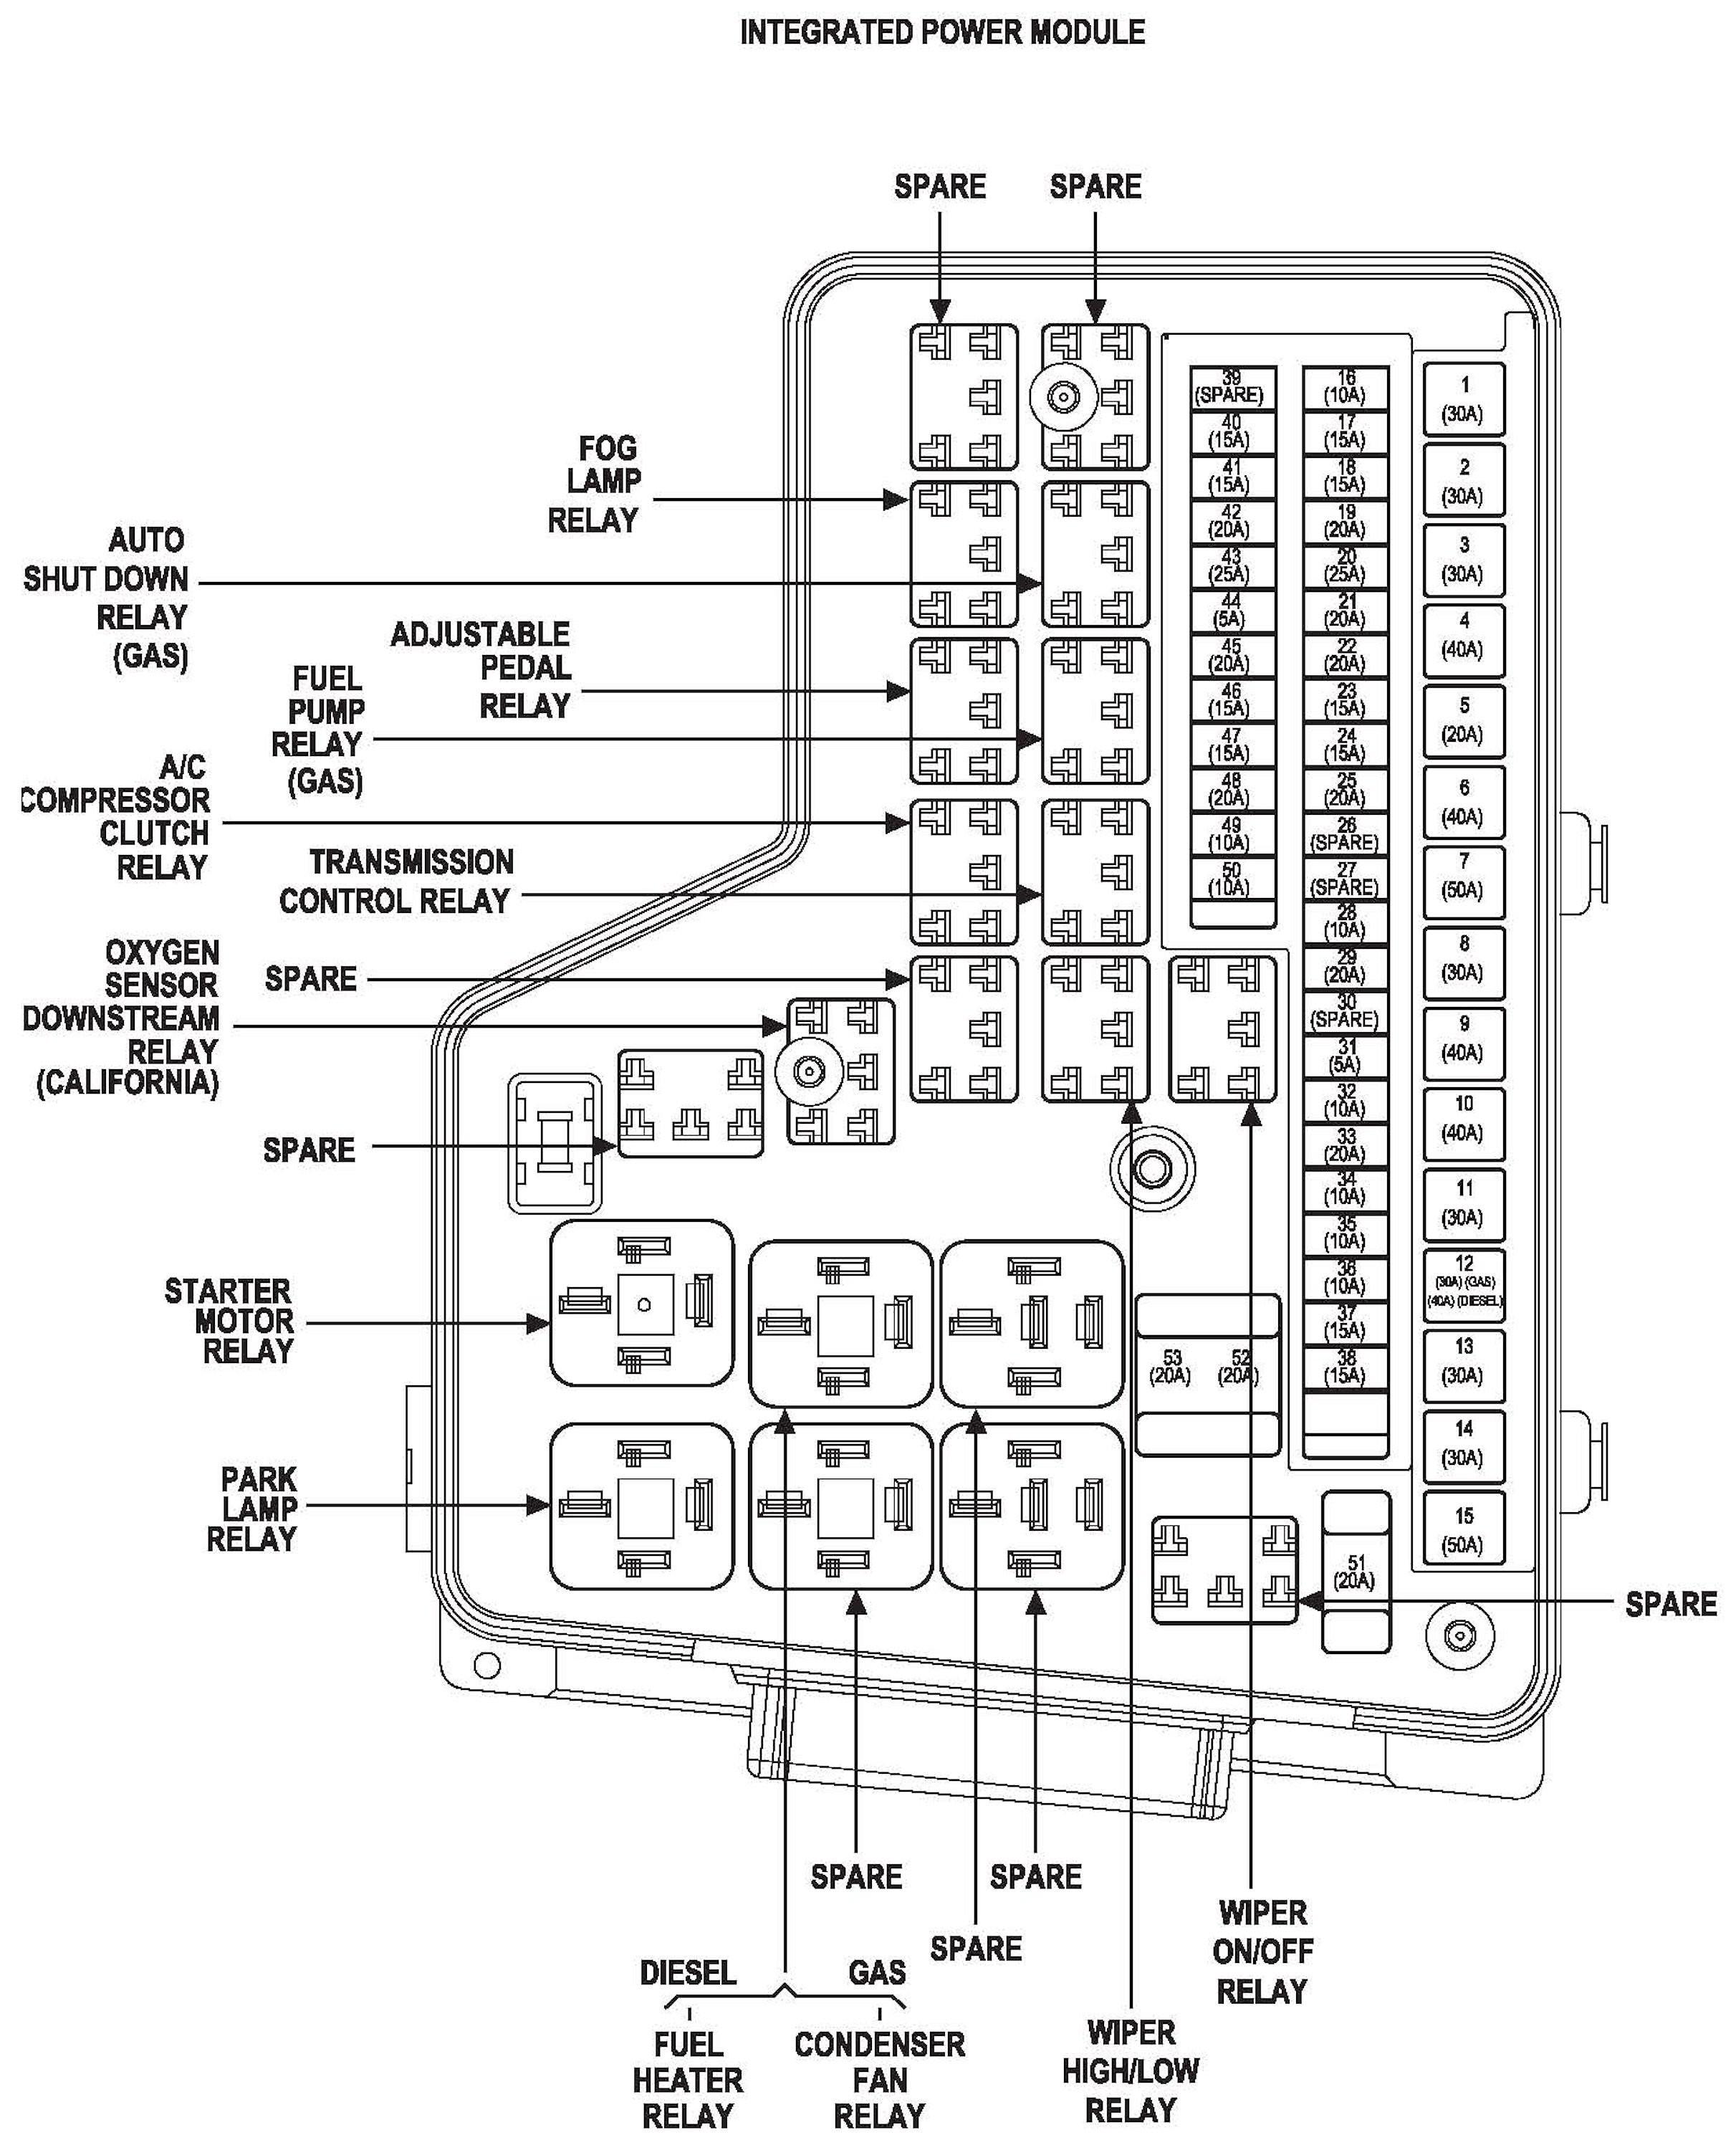 Ram Fuse Box | Wiring Diagram - 2004 Dodge Ram 1500 Wiring Diagram